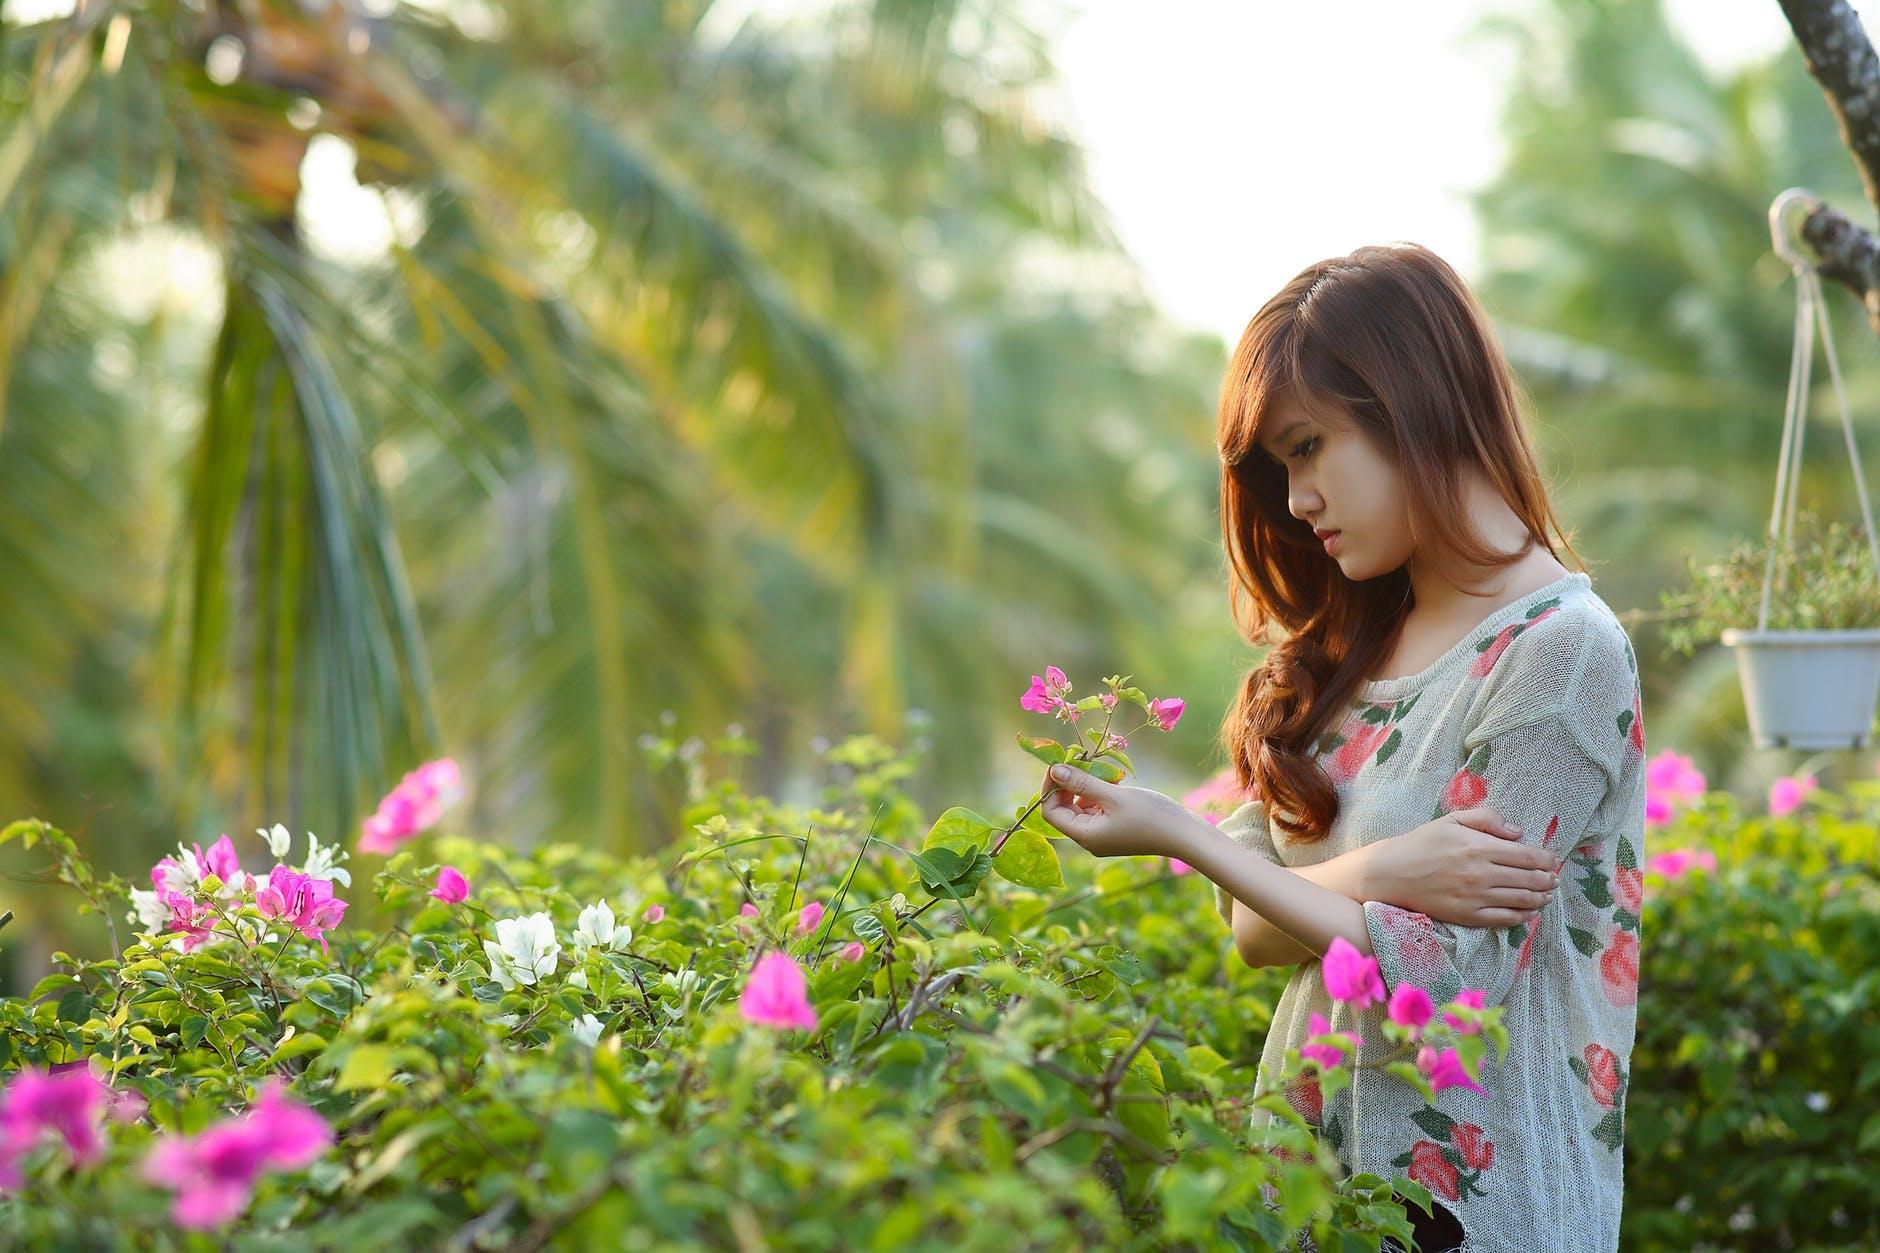 Woman enjoying the plants in her garden